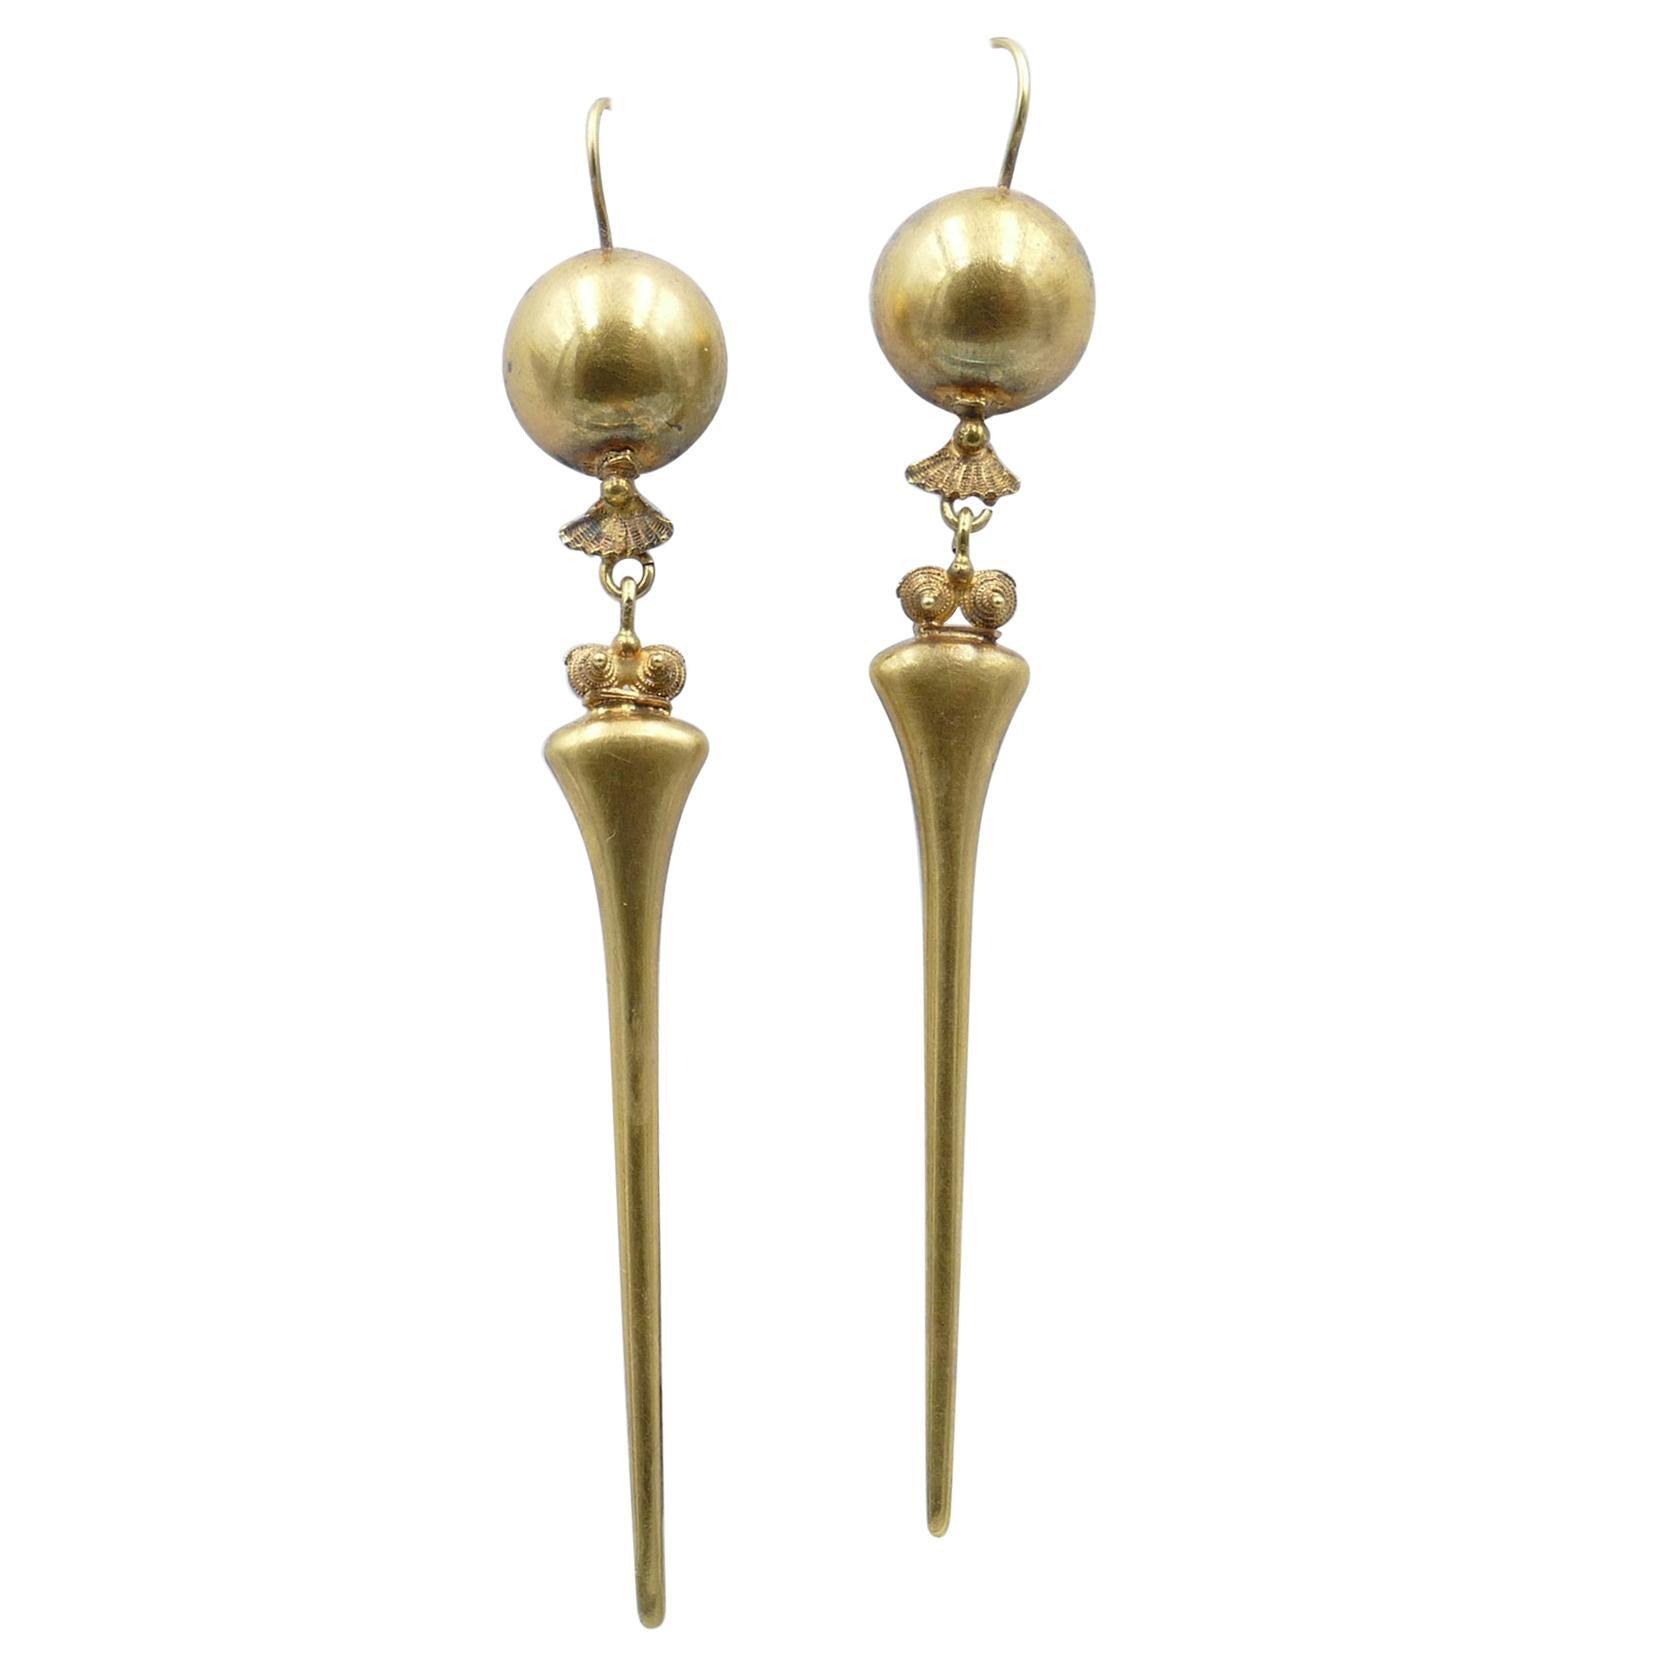 Victorian Handmade 9 Carat Yellow Gold Drop Earrings